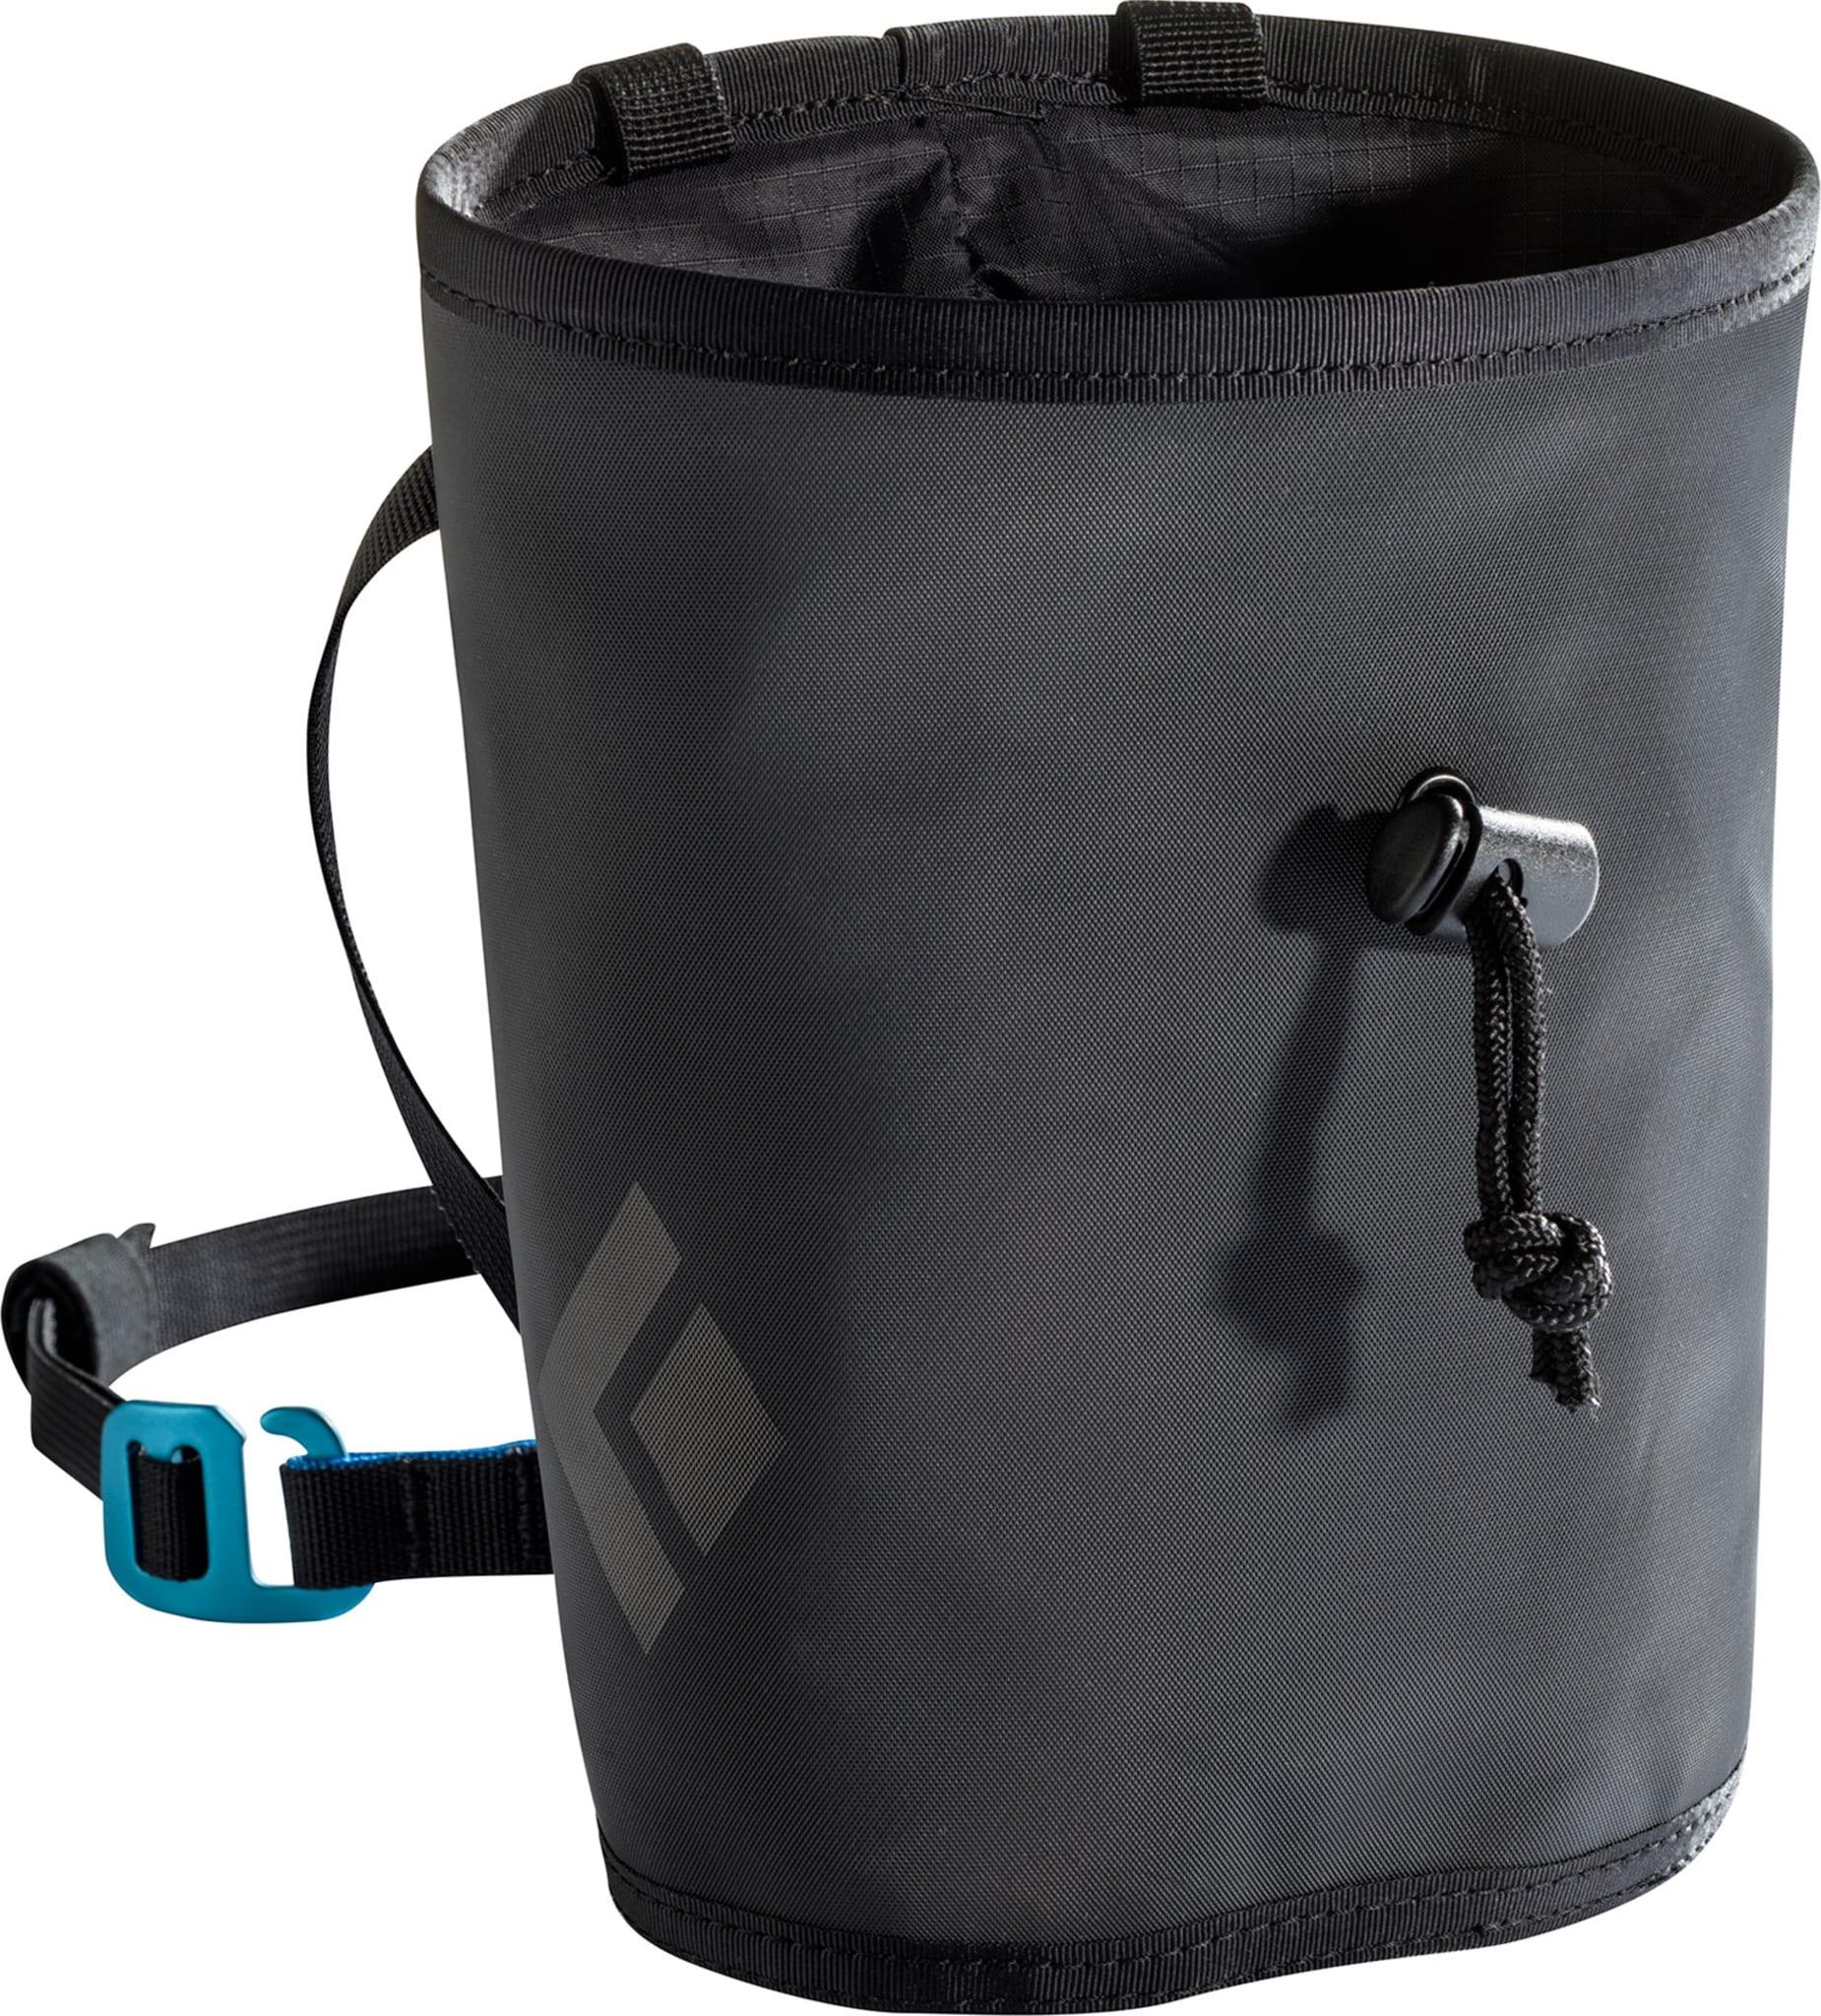 Kalkpose for krafsing i kaminer og aking over sva